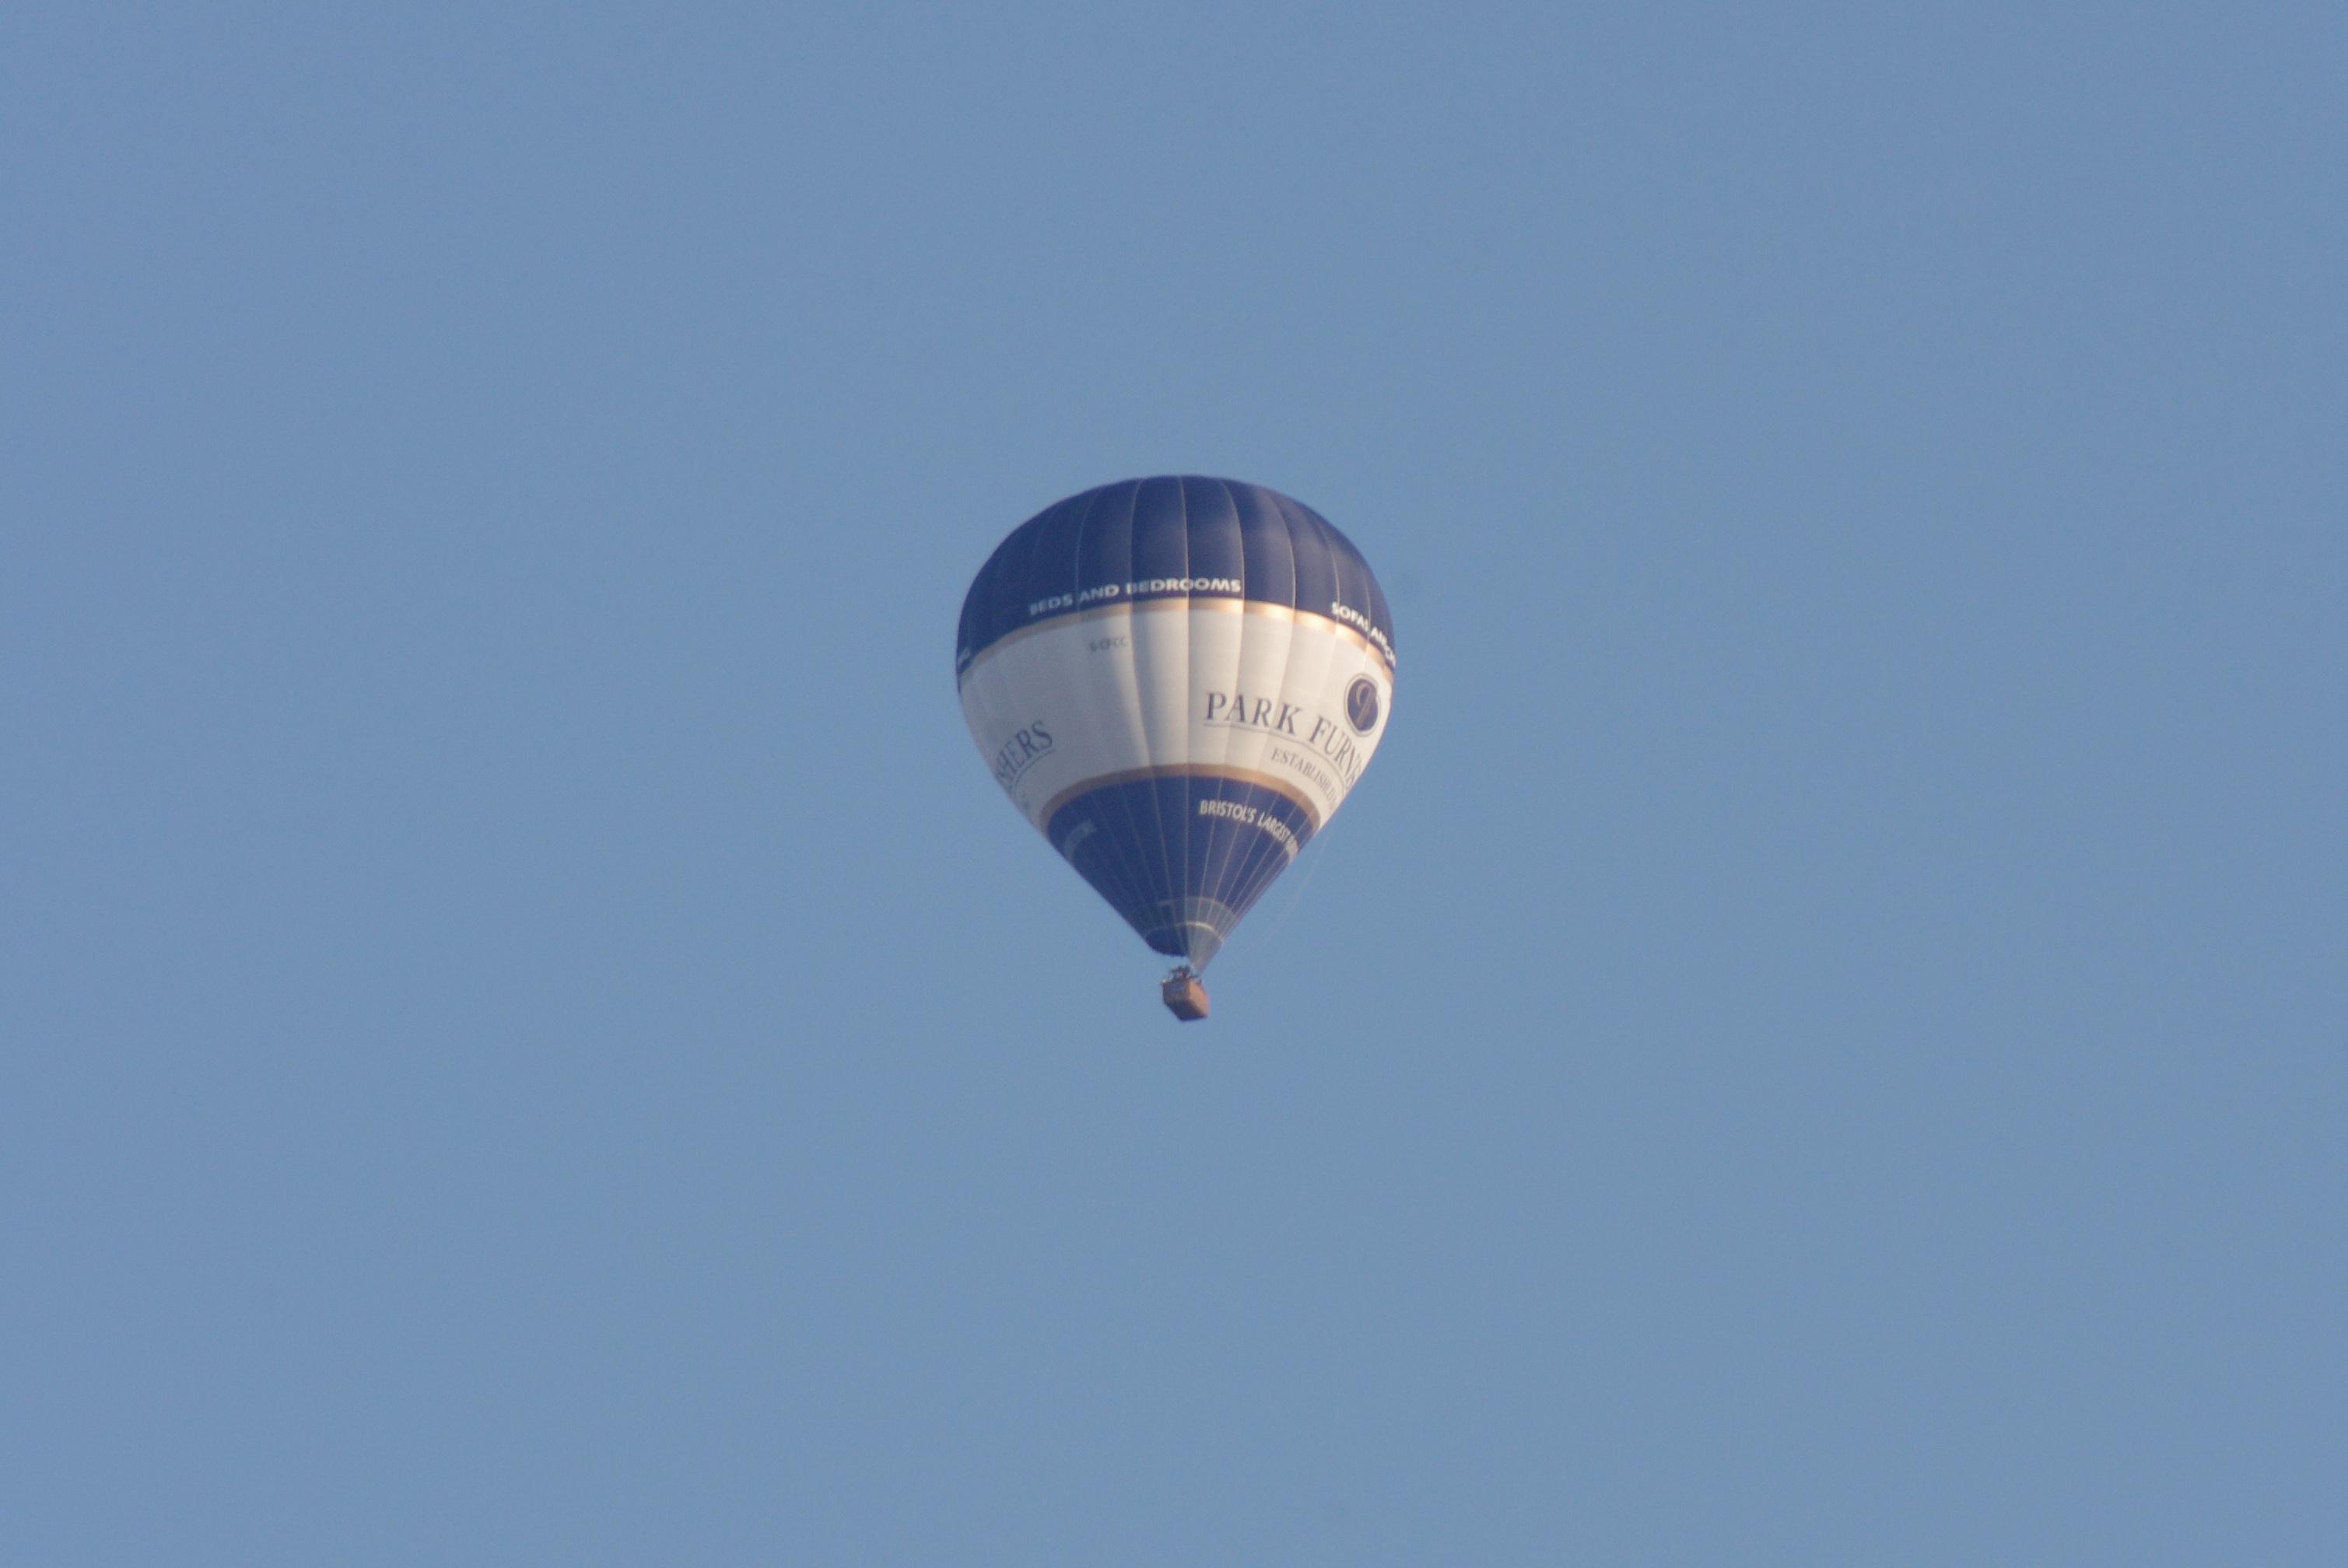 Bristol Balloon Fiesta 2016 Bristol Balloon Fiesta.jpg